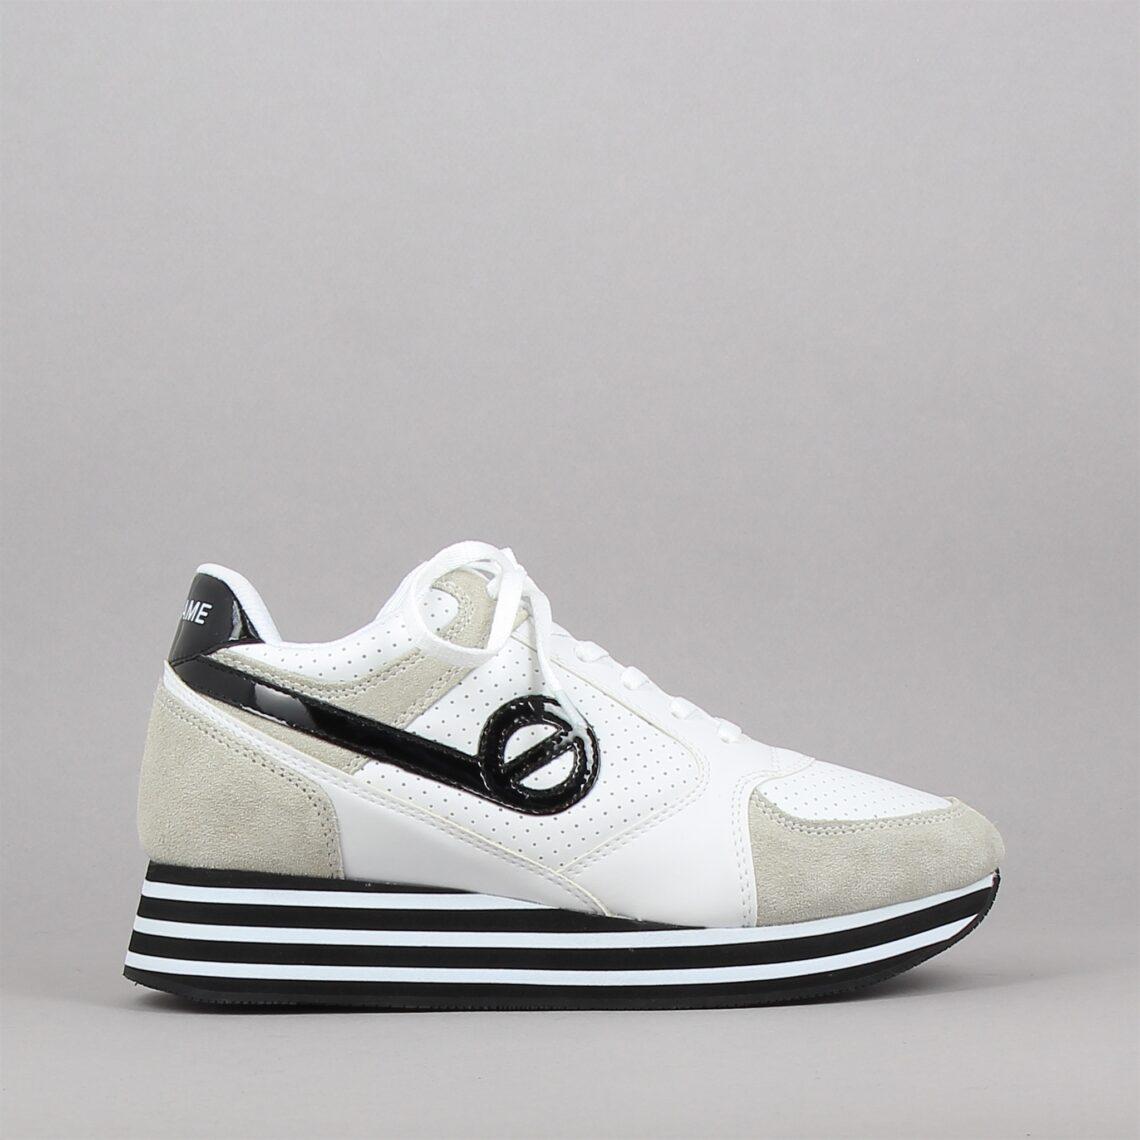 parko-jogger-19-blanc-171851778-0.jpg